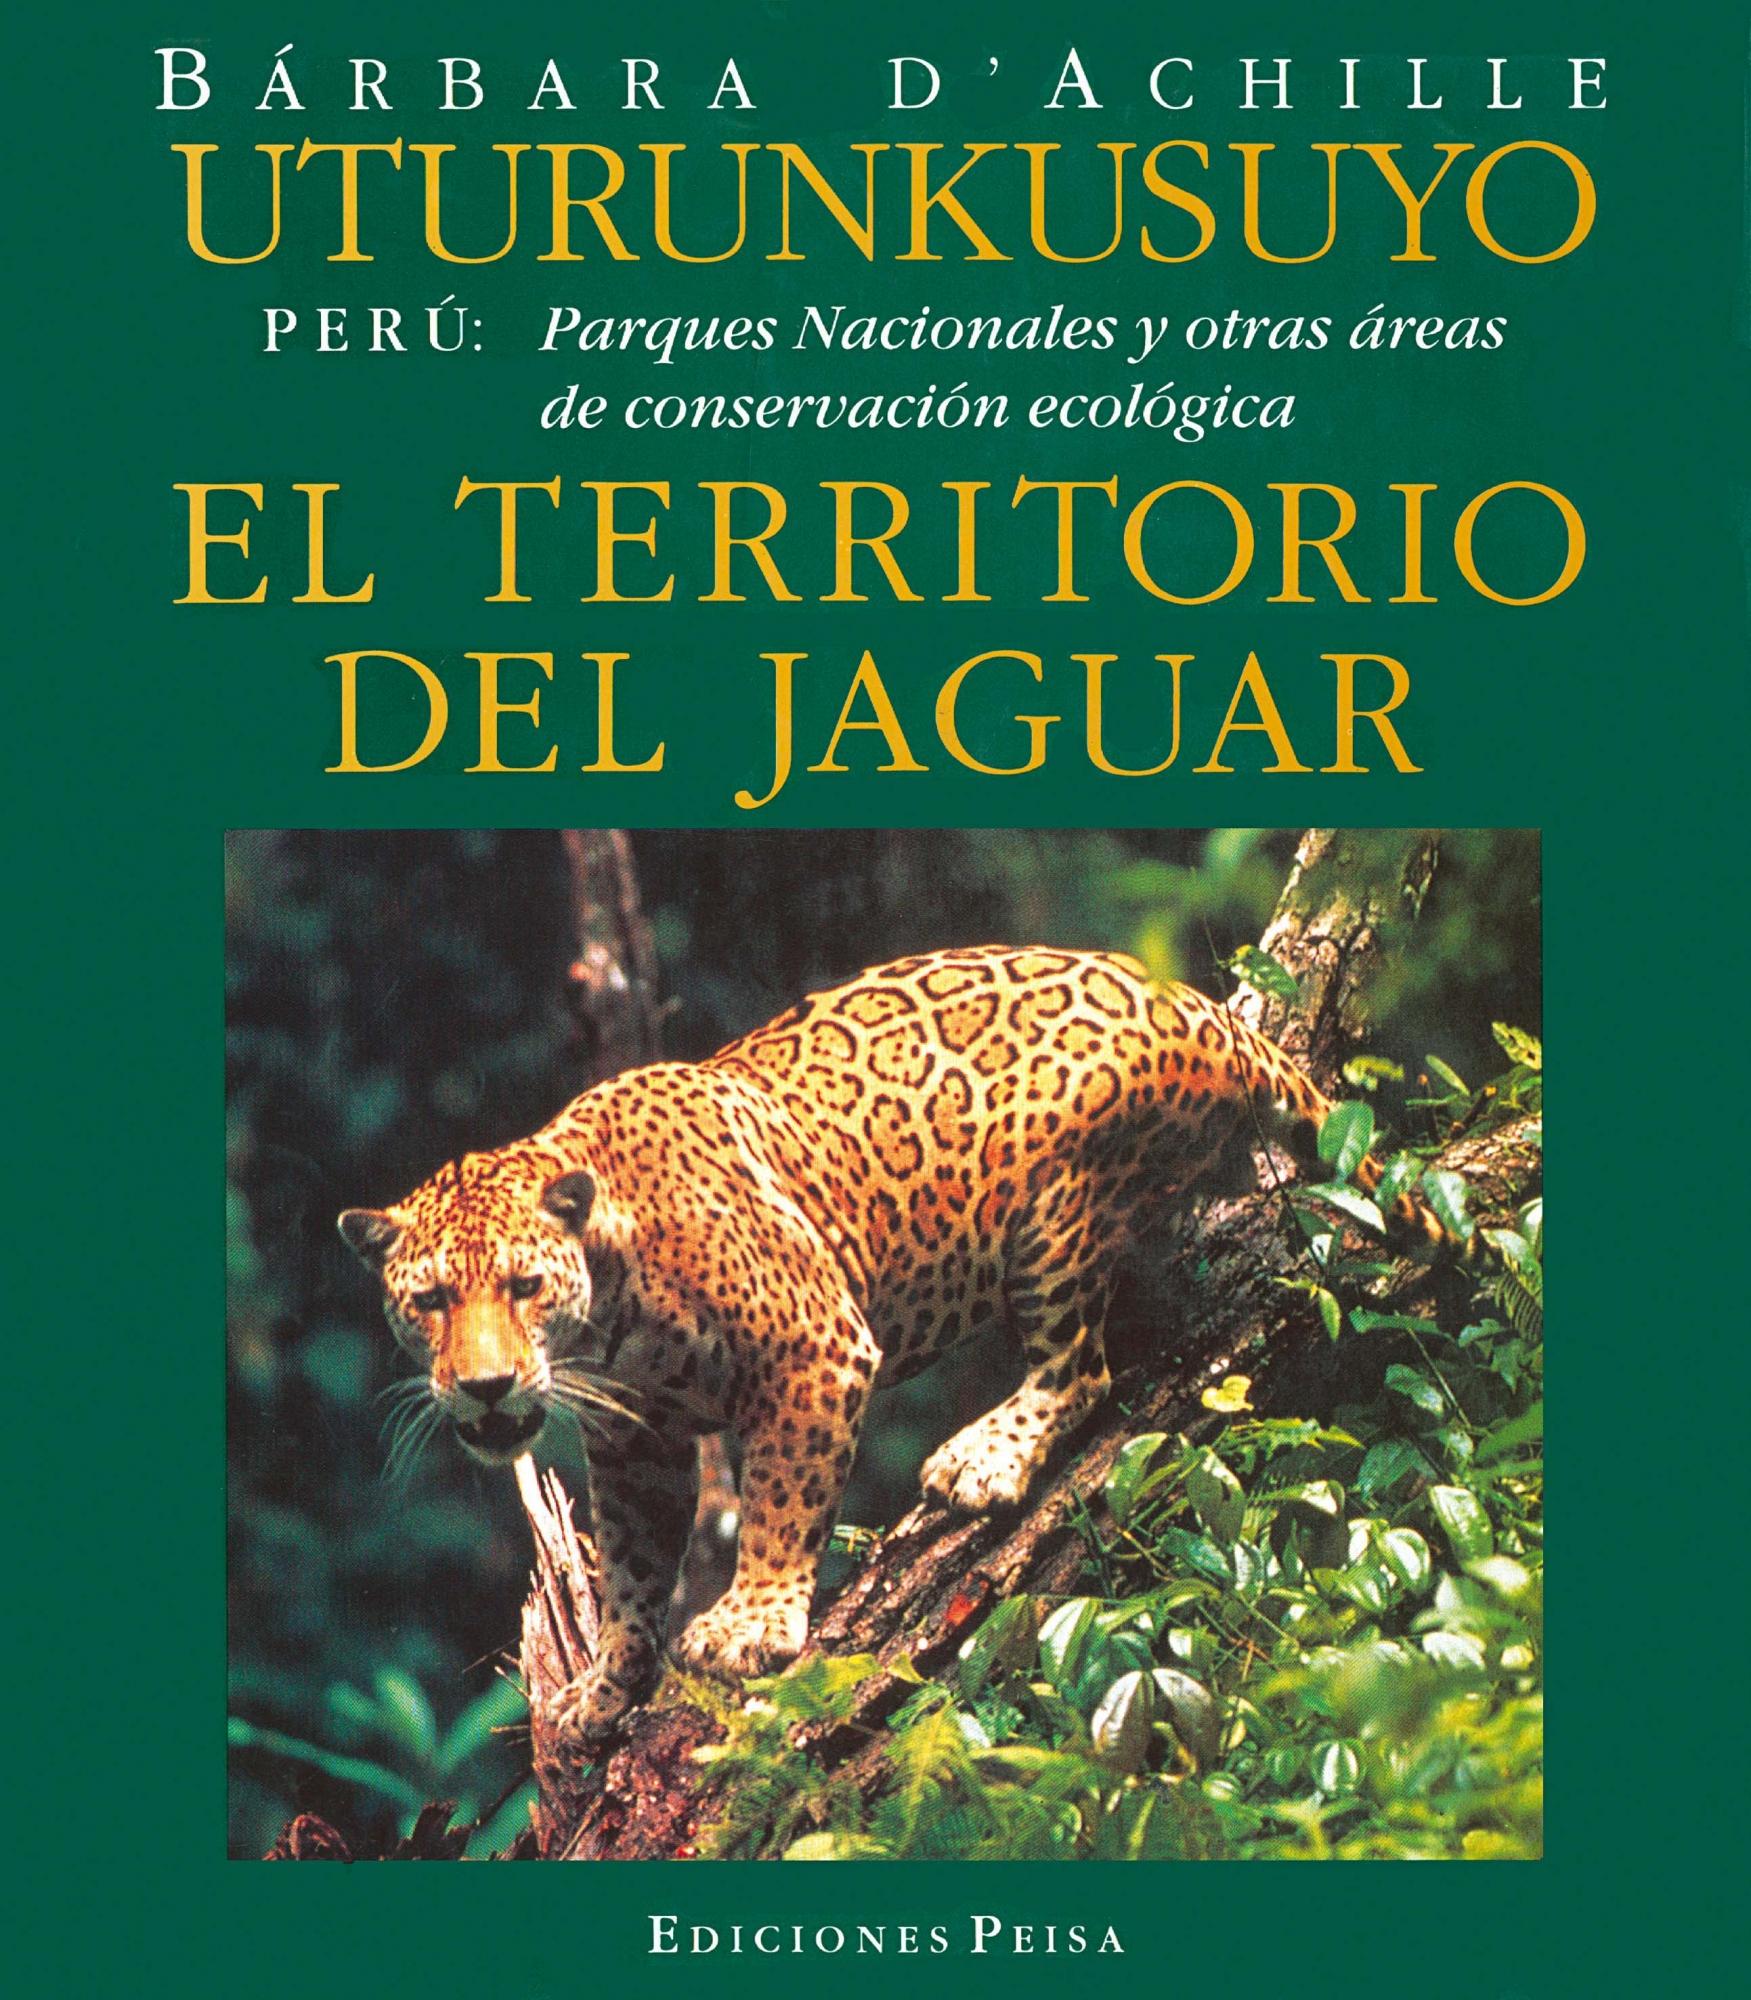 UTURUNKUSUYO: EL TERRITORIO DEL JAGUAR